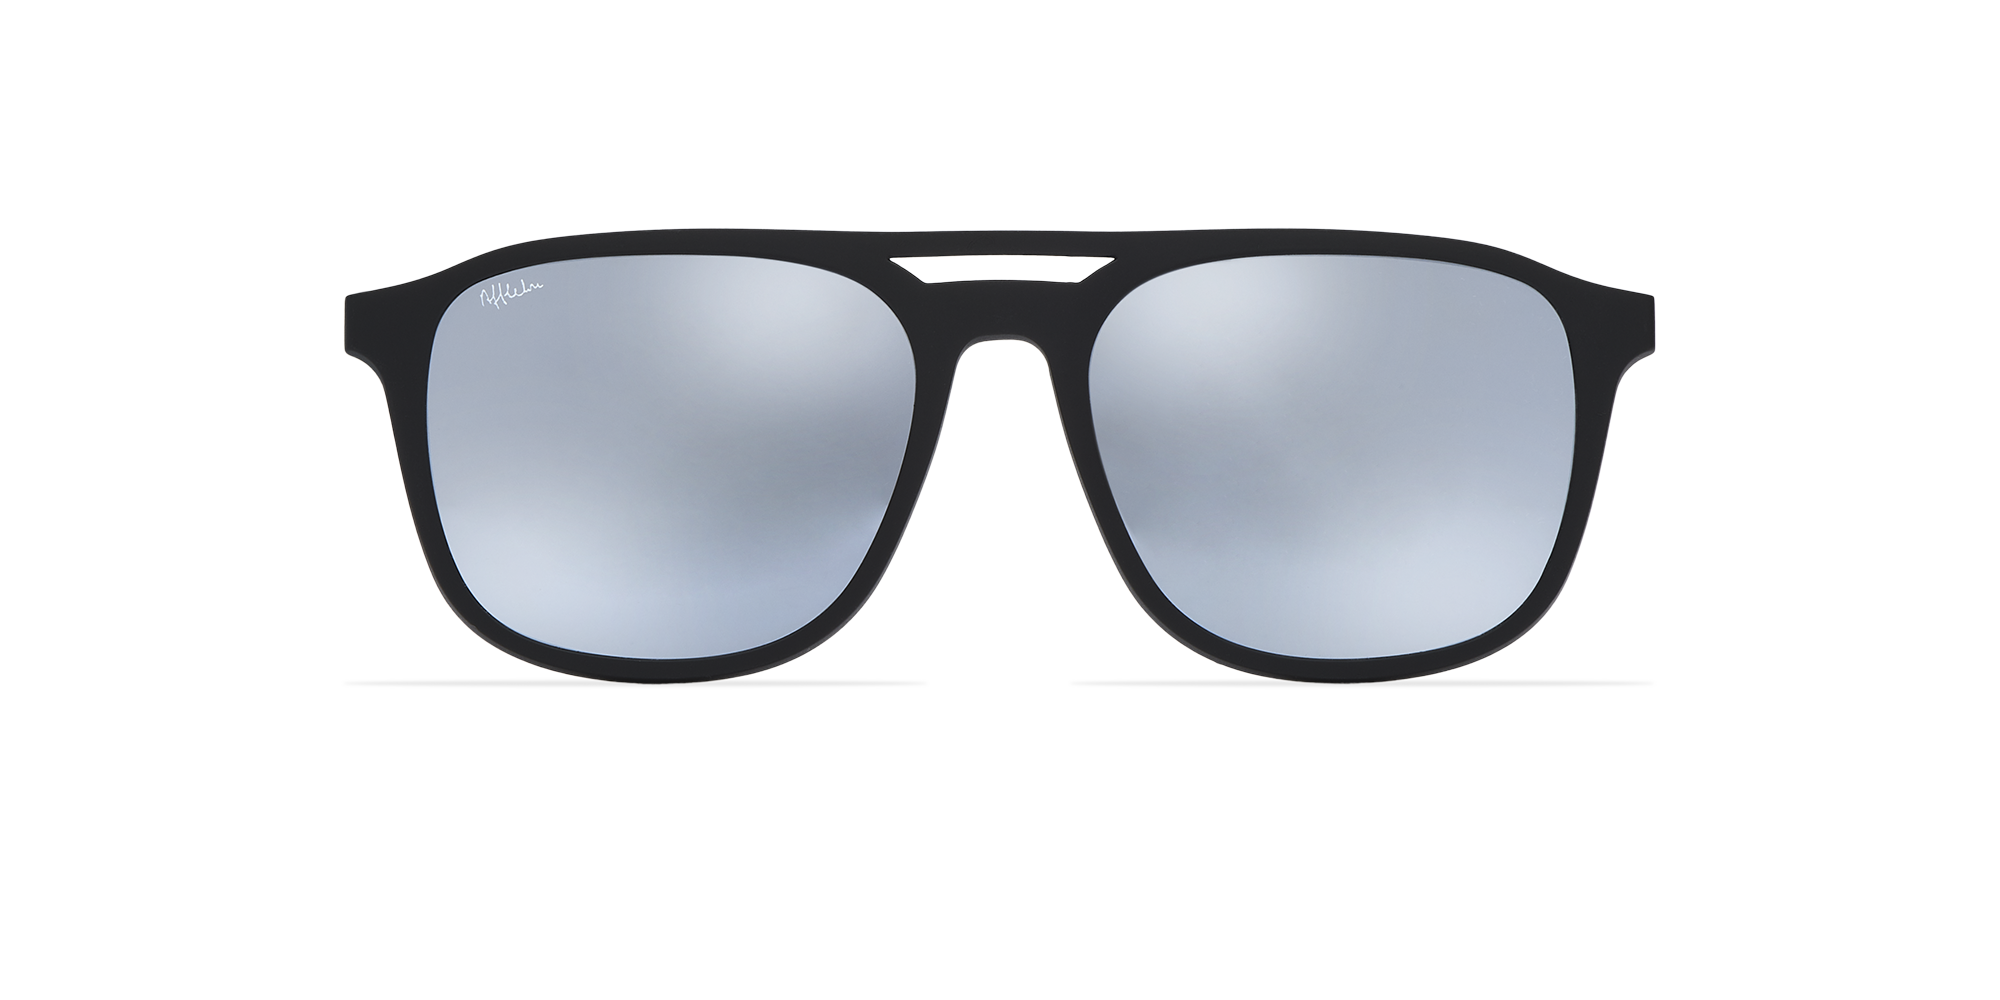 afflelou/france/products/smart_clip/clips_glasses/07630036428894_face.png